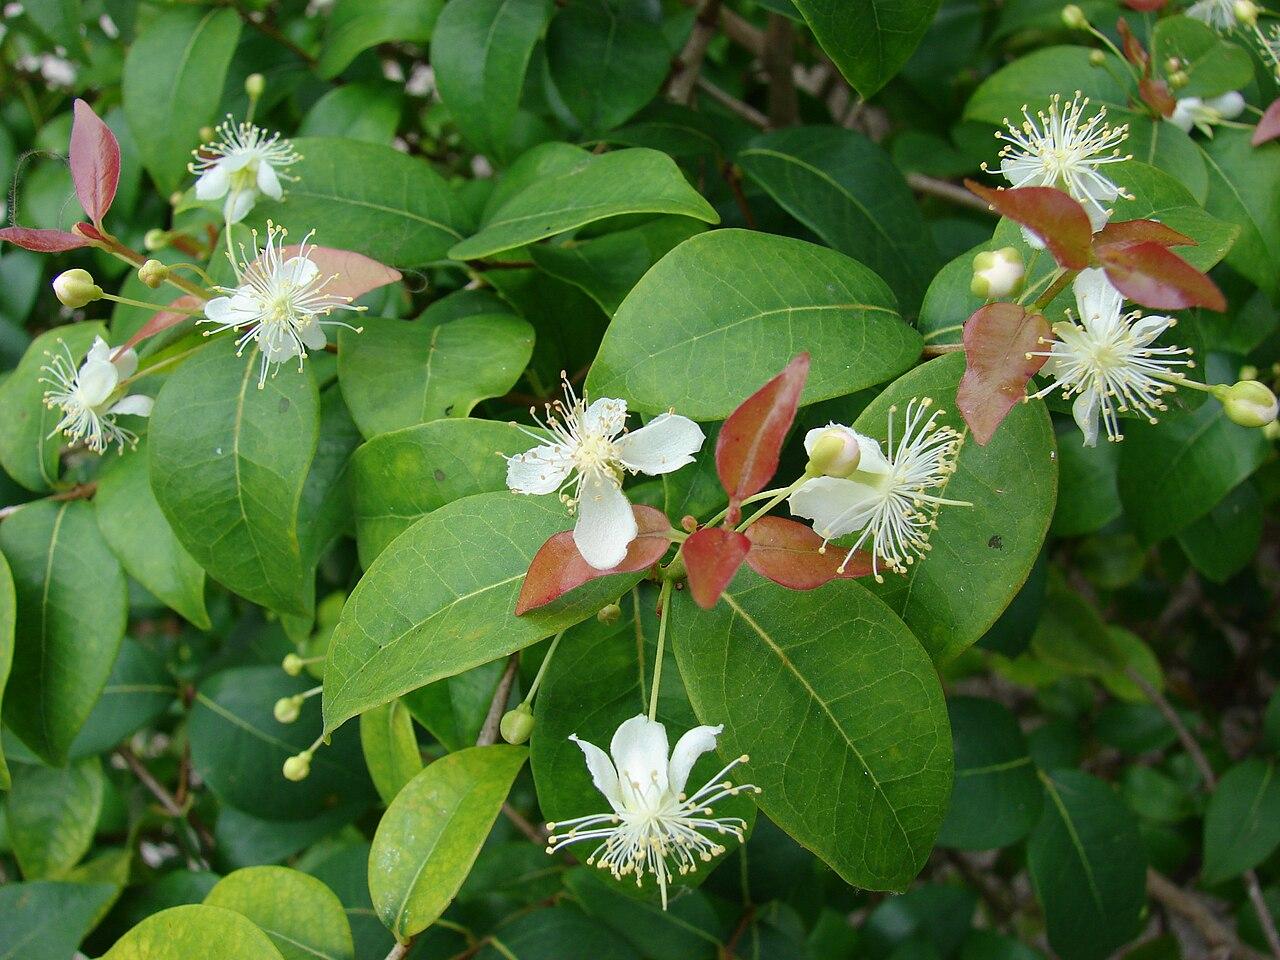 Eugenia uniflora flowers